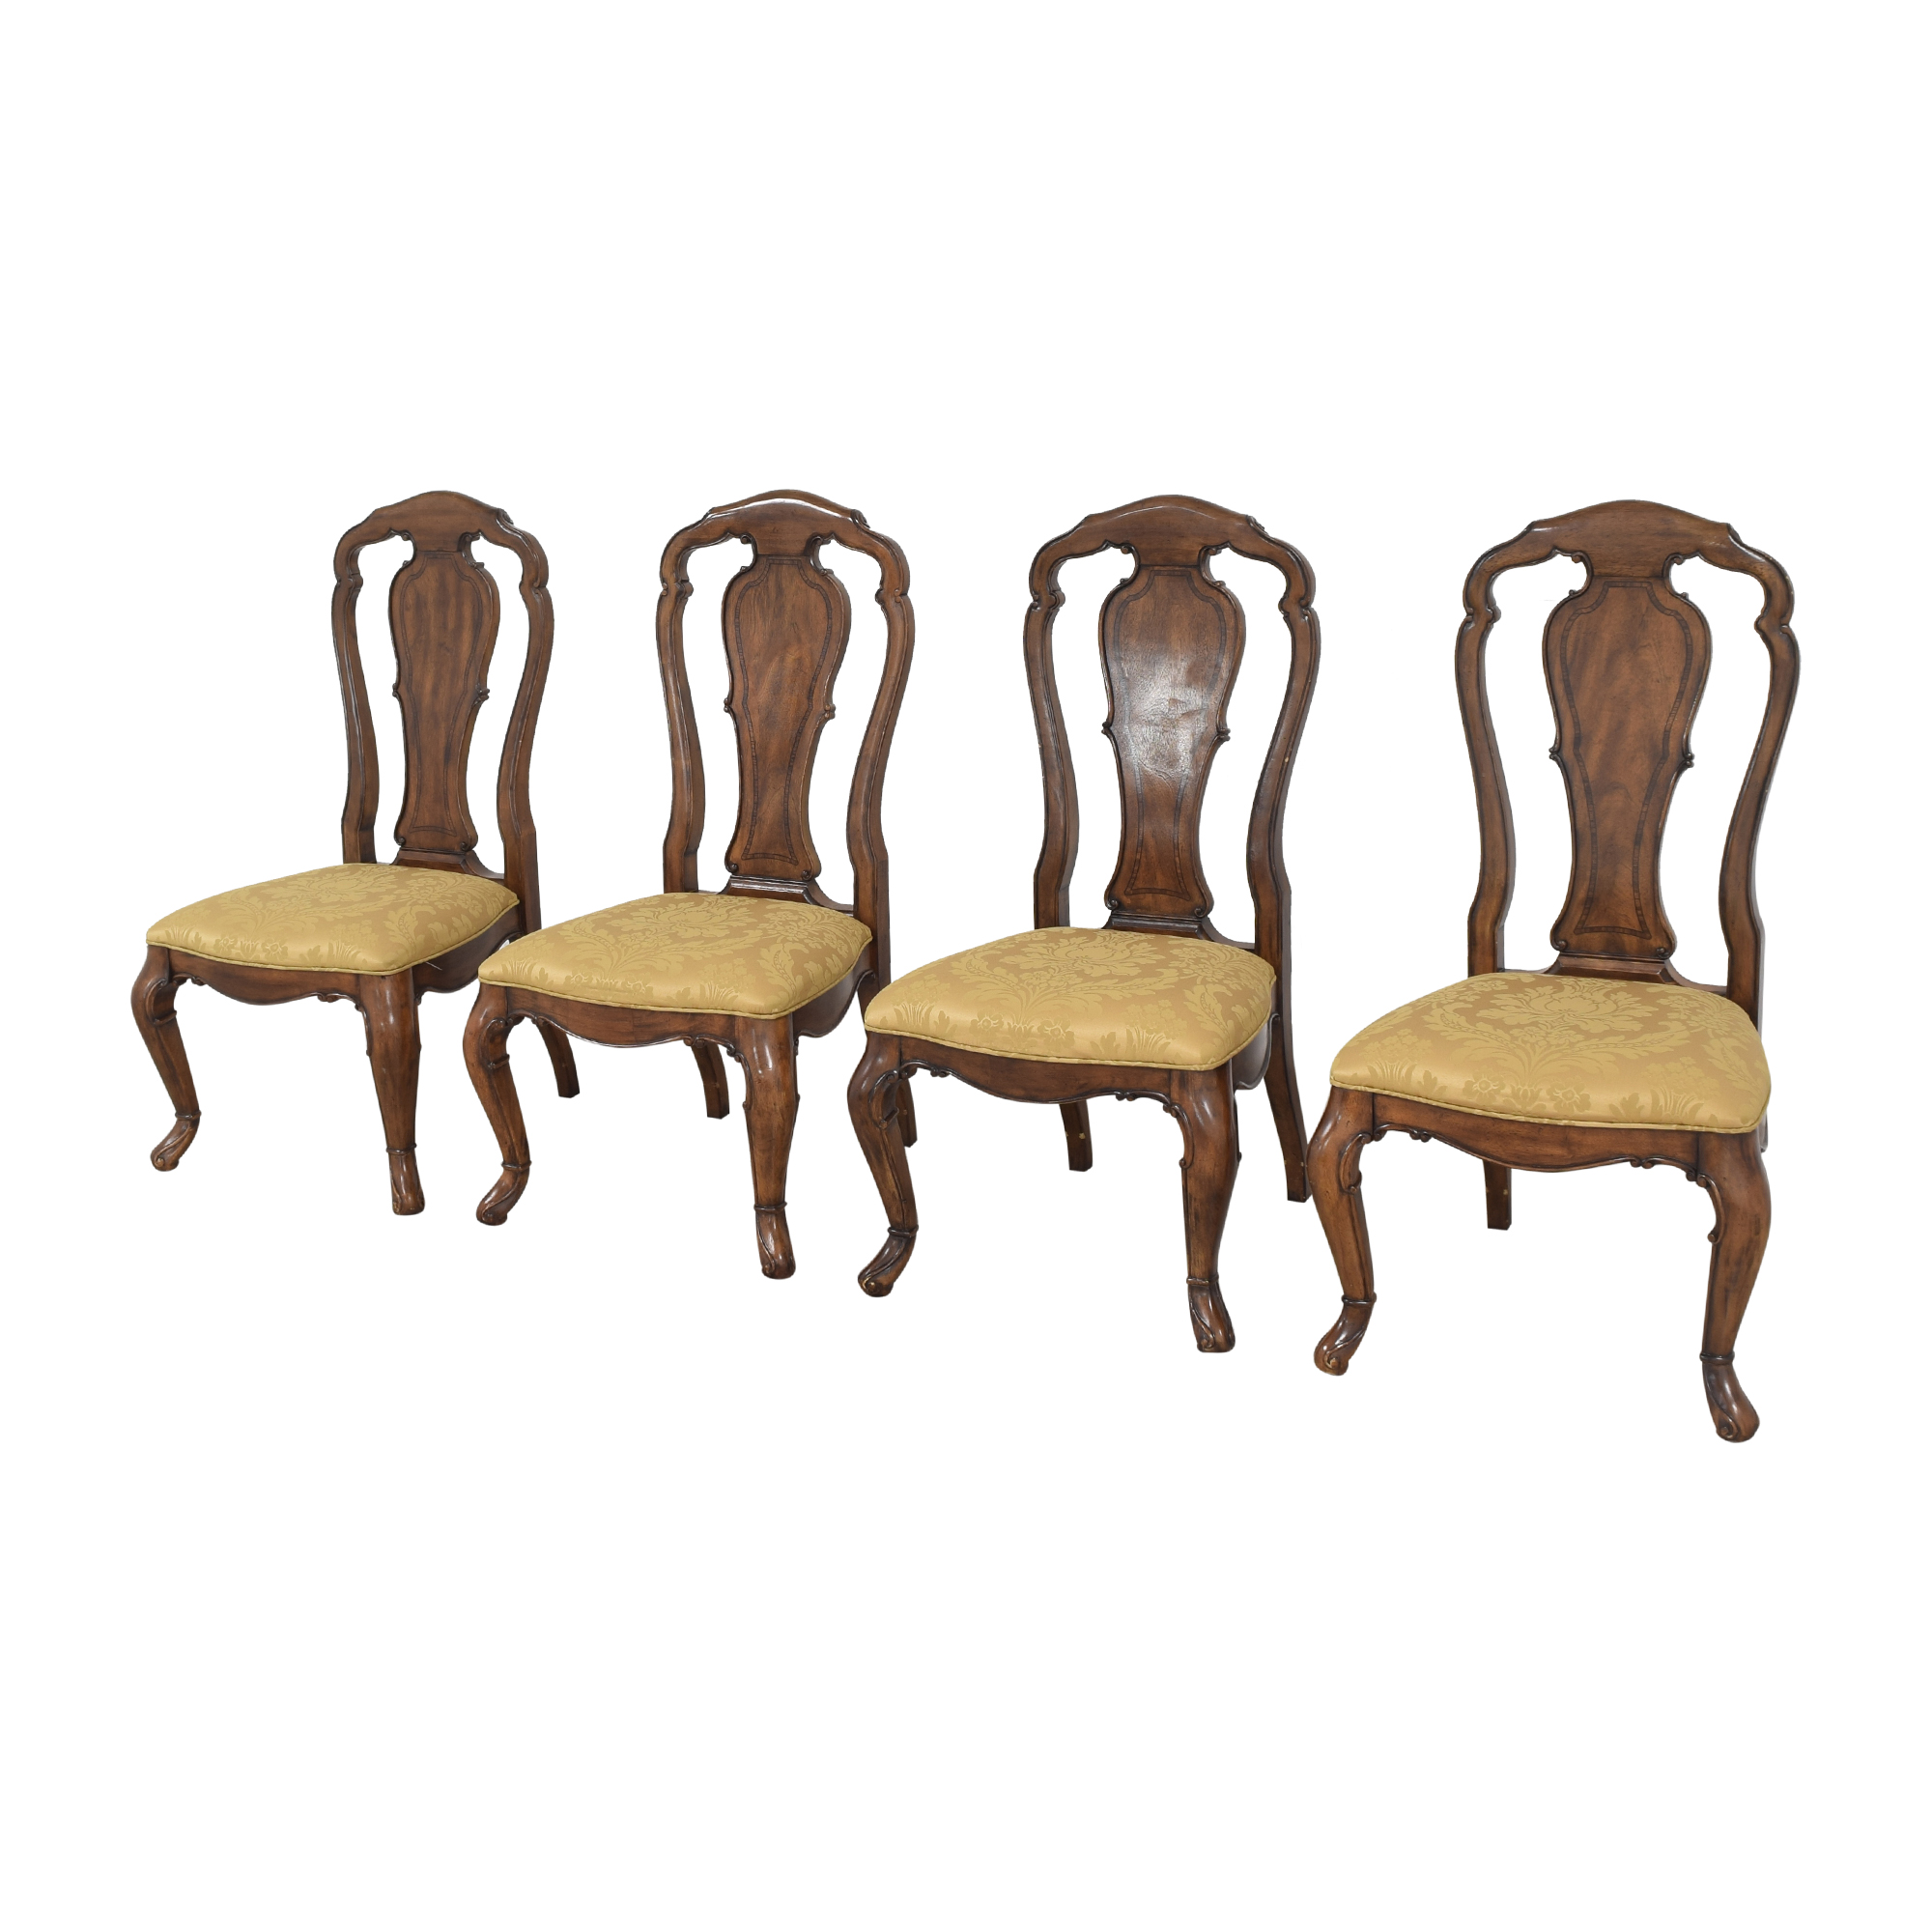 Thomasville Thomasville Ernest Hemingway Granada Dining Chairs ct